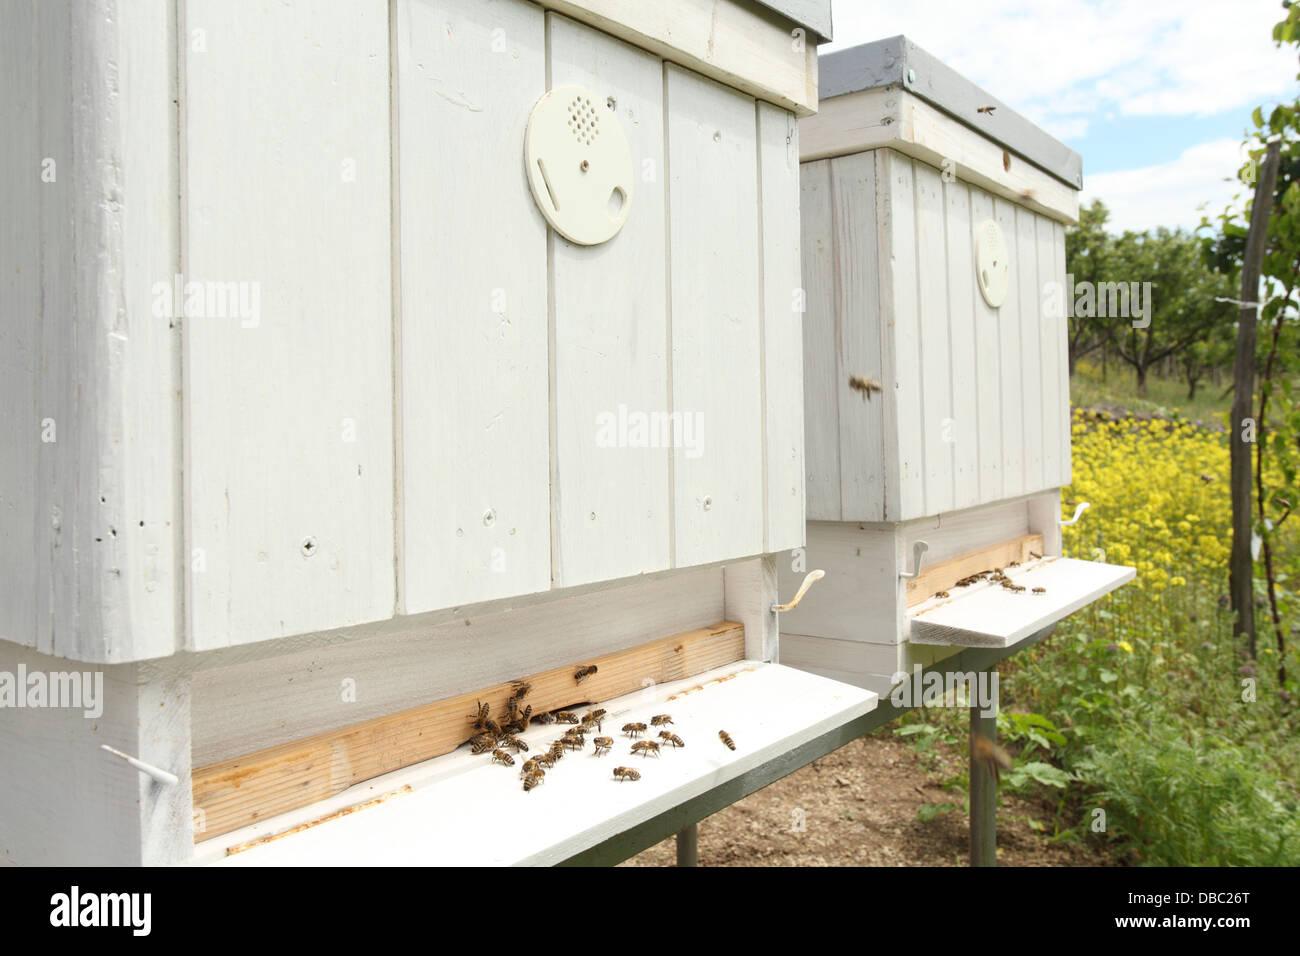 The European honey bees (Apis mellifera) at the entrance of bee hives.. Location: Male Karpaty, Slovakia. - Stock Image